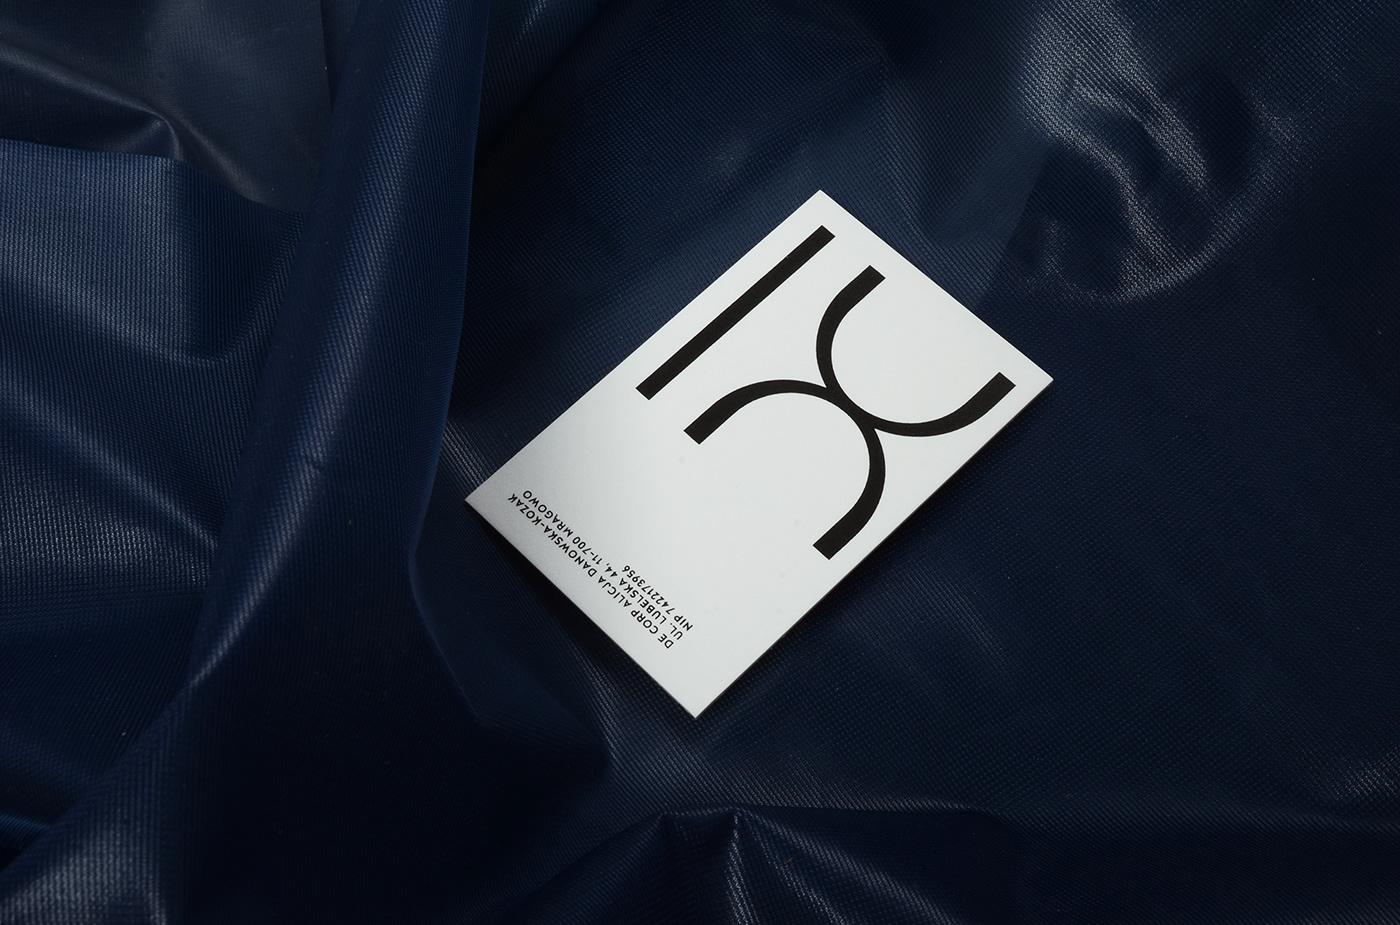 Fashion  identity branding  buisnesscard pricetag logo Logotype sign delicate experimental